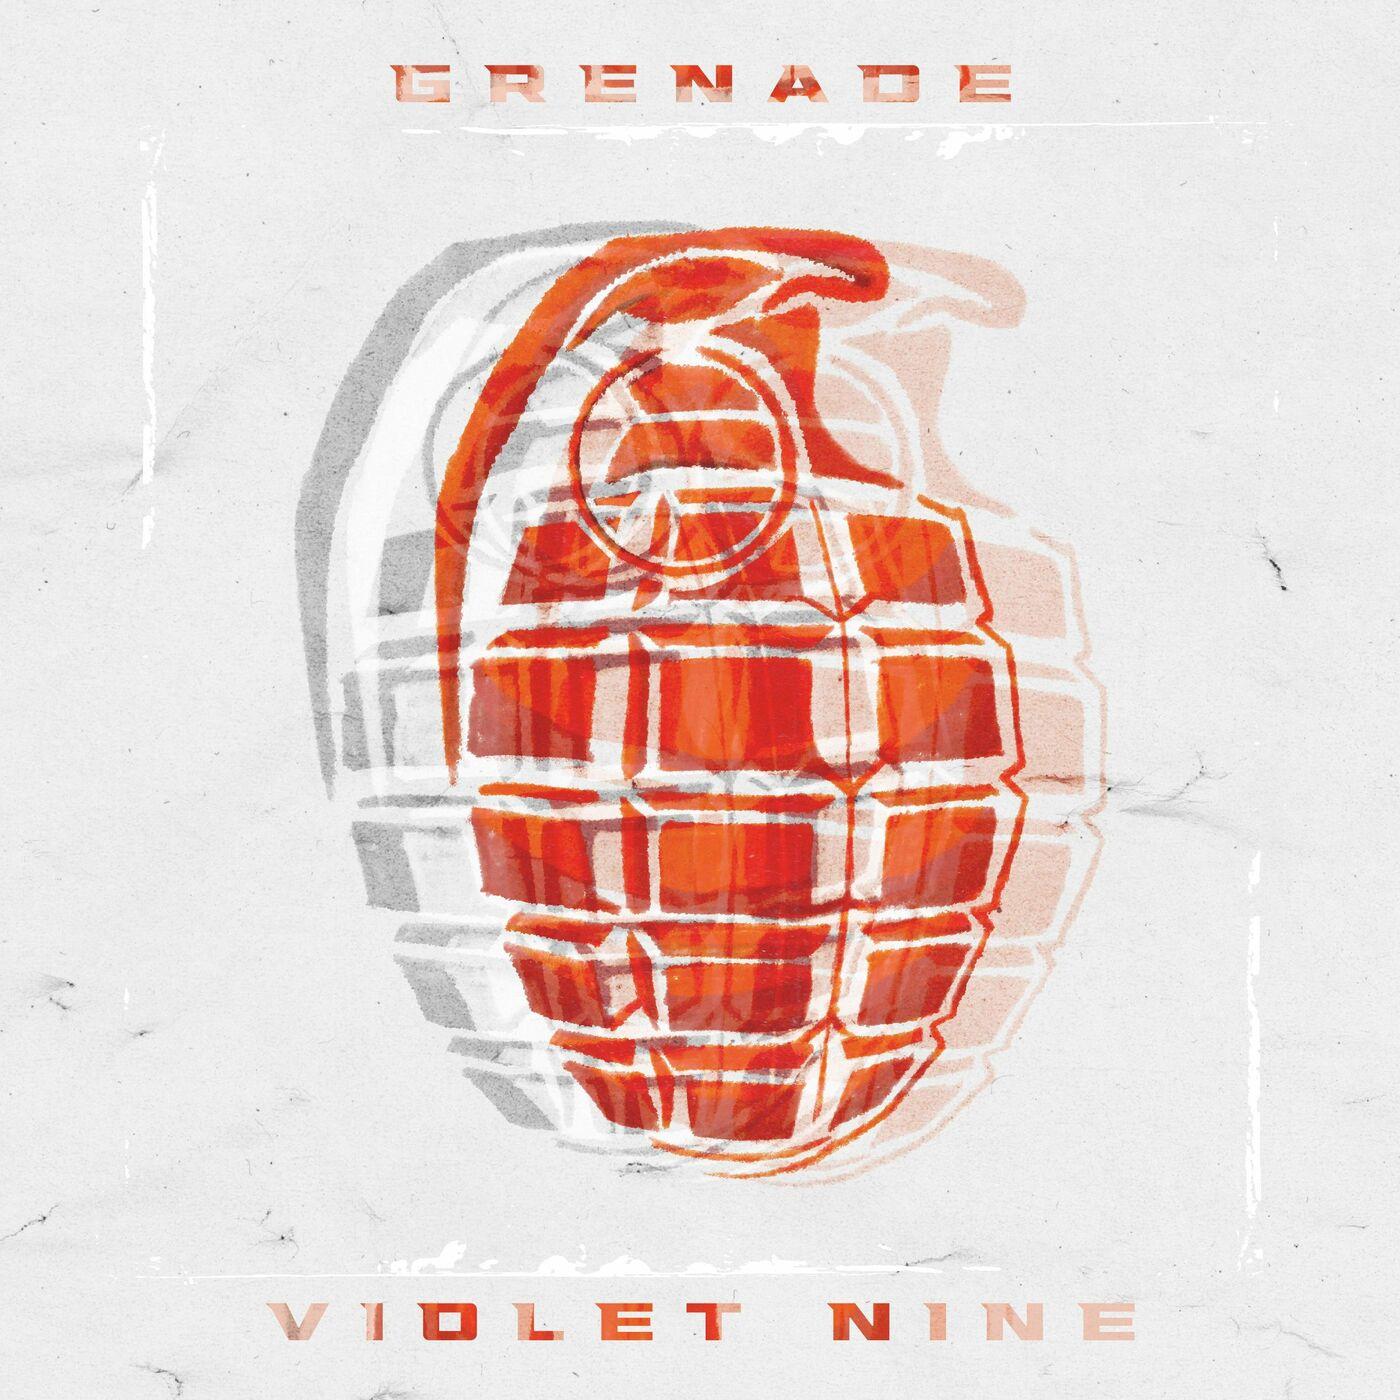 Violet Nine - Grenade [single] (2021)